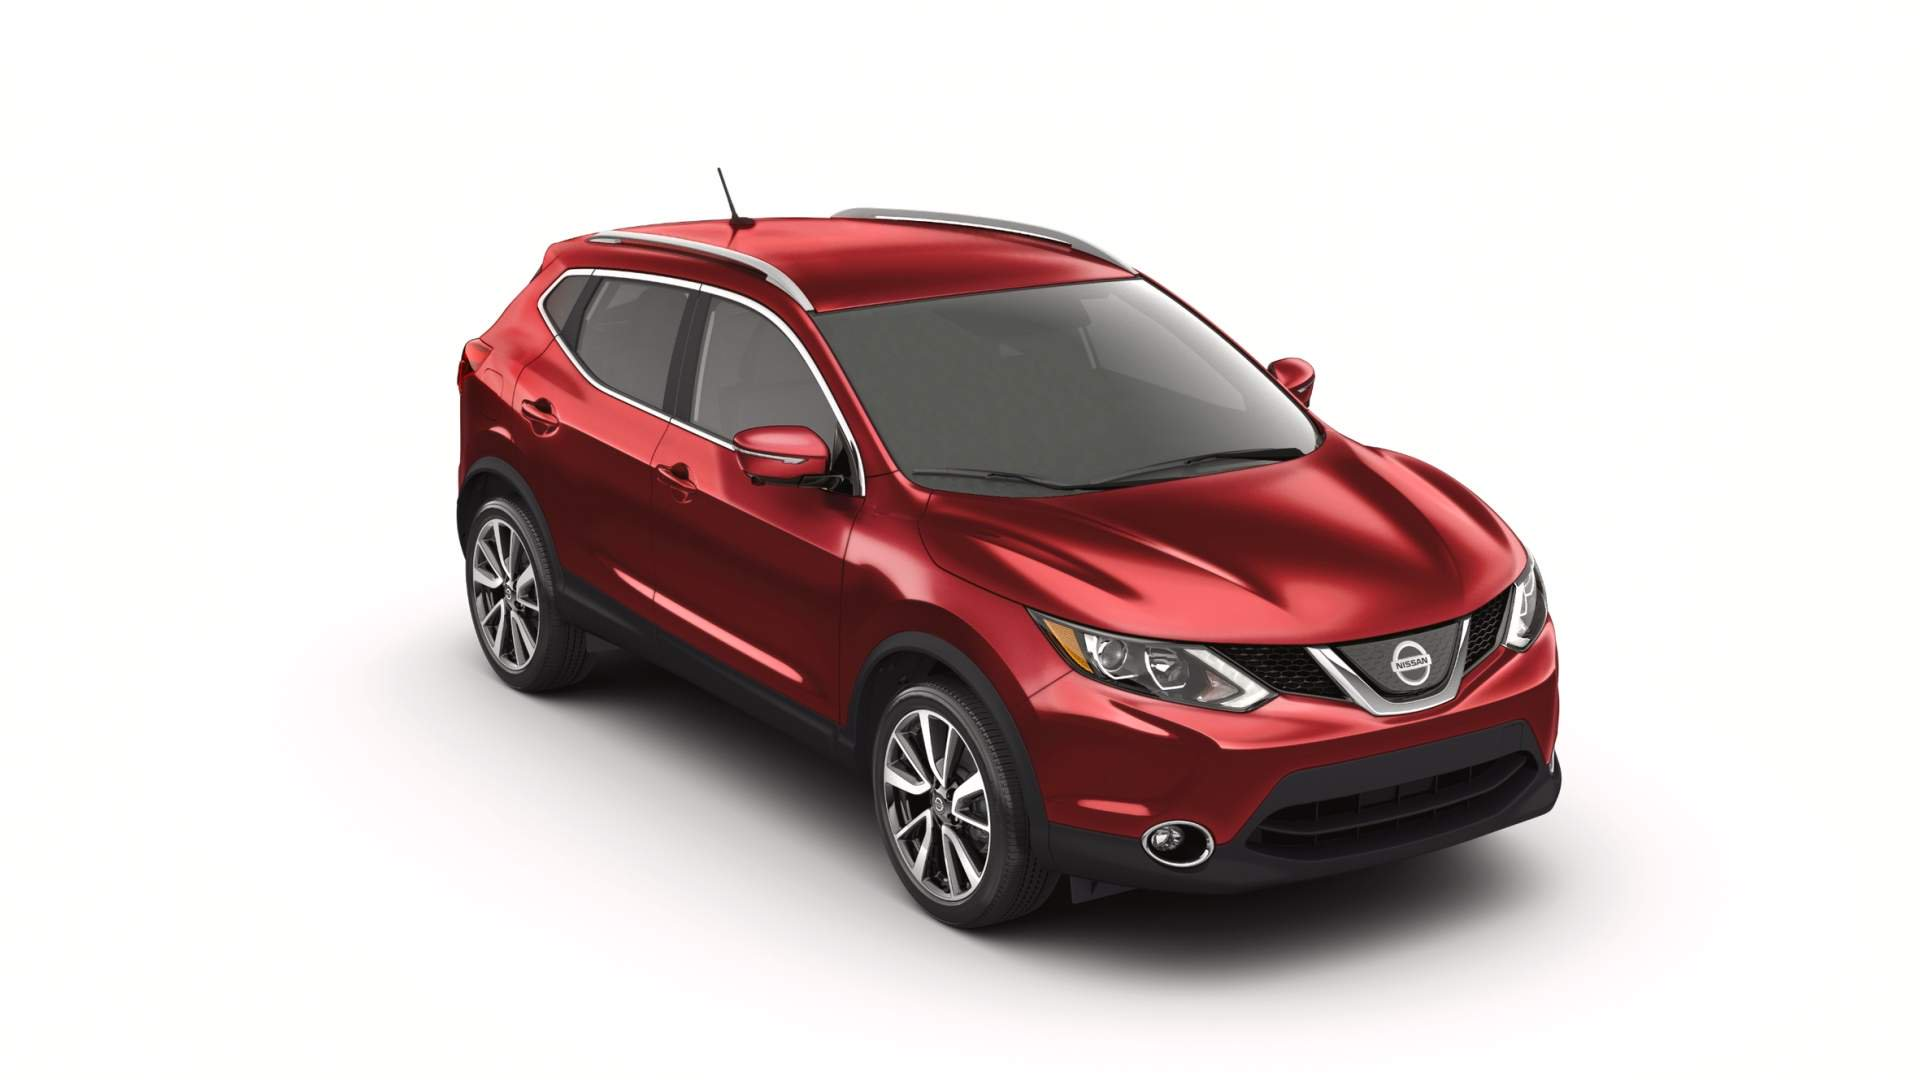 2019 Nissan Rogue Sport Starts At $23,235 - autoevolution